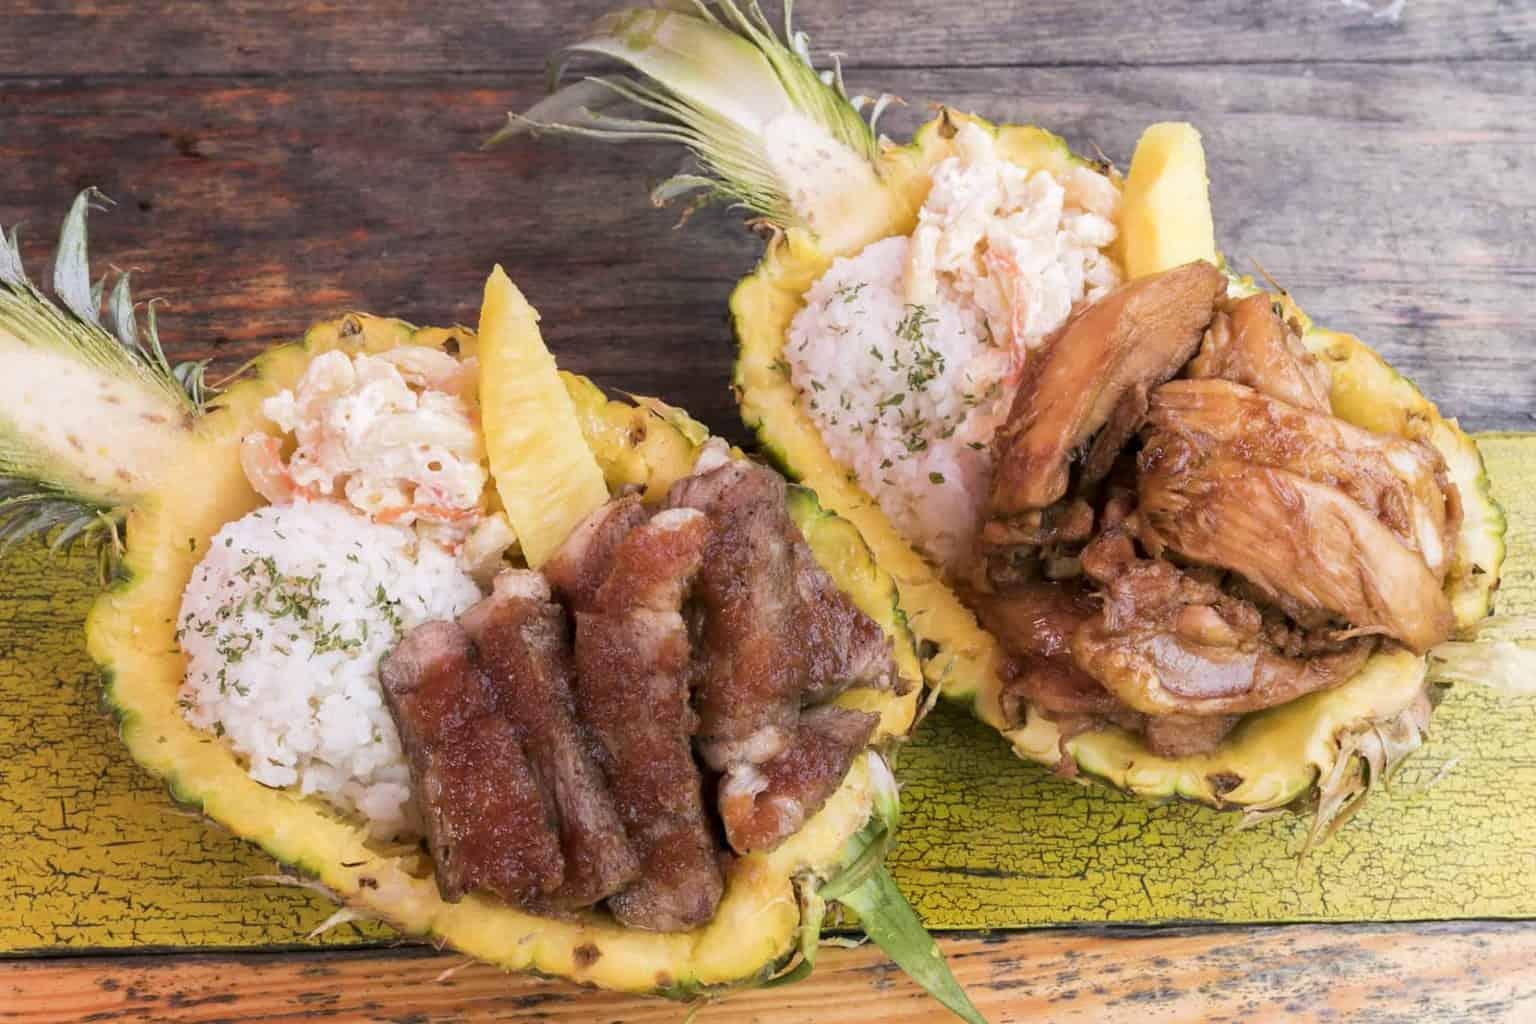 Thai Food Ala Moana